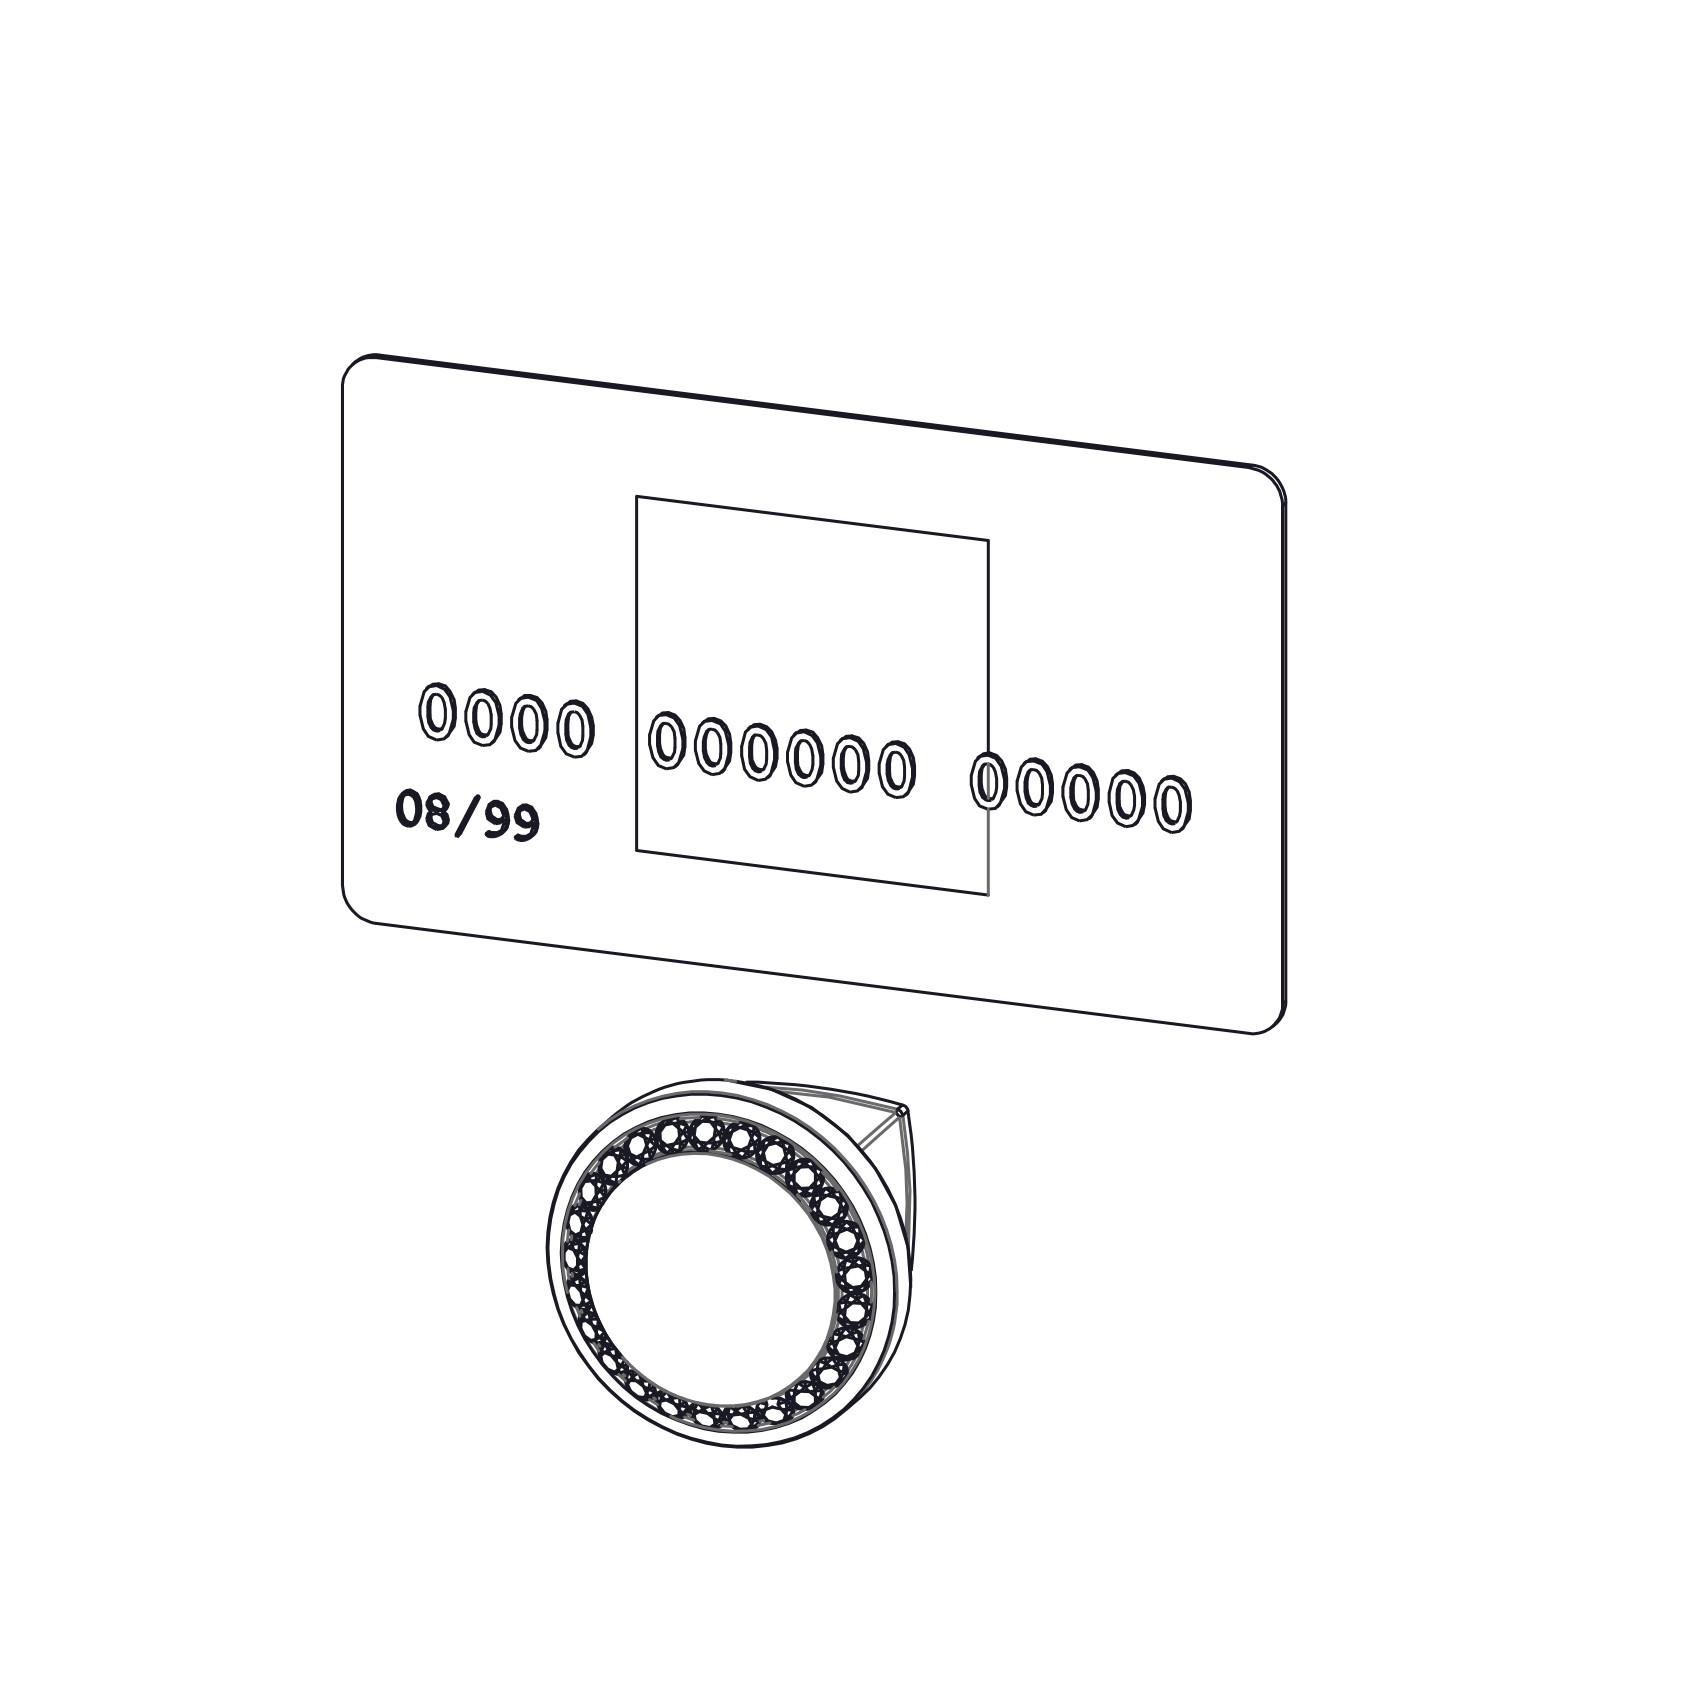 Isabel Crystal Cabinet Hardware Knob, White1 1/4 Inch Diameter